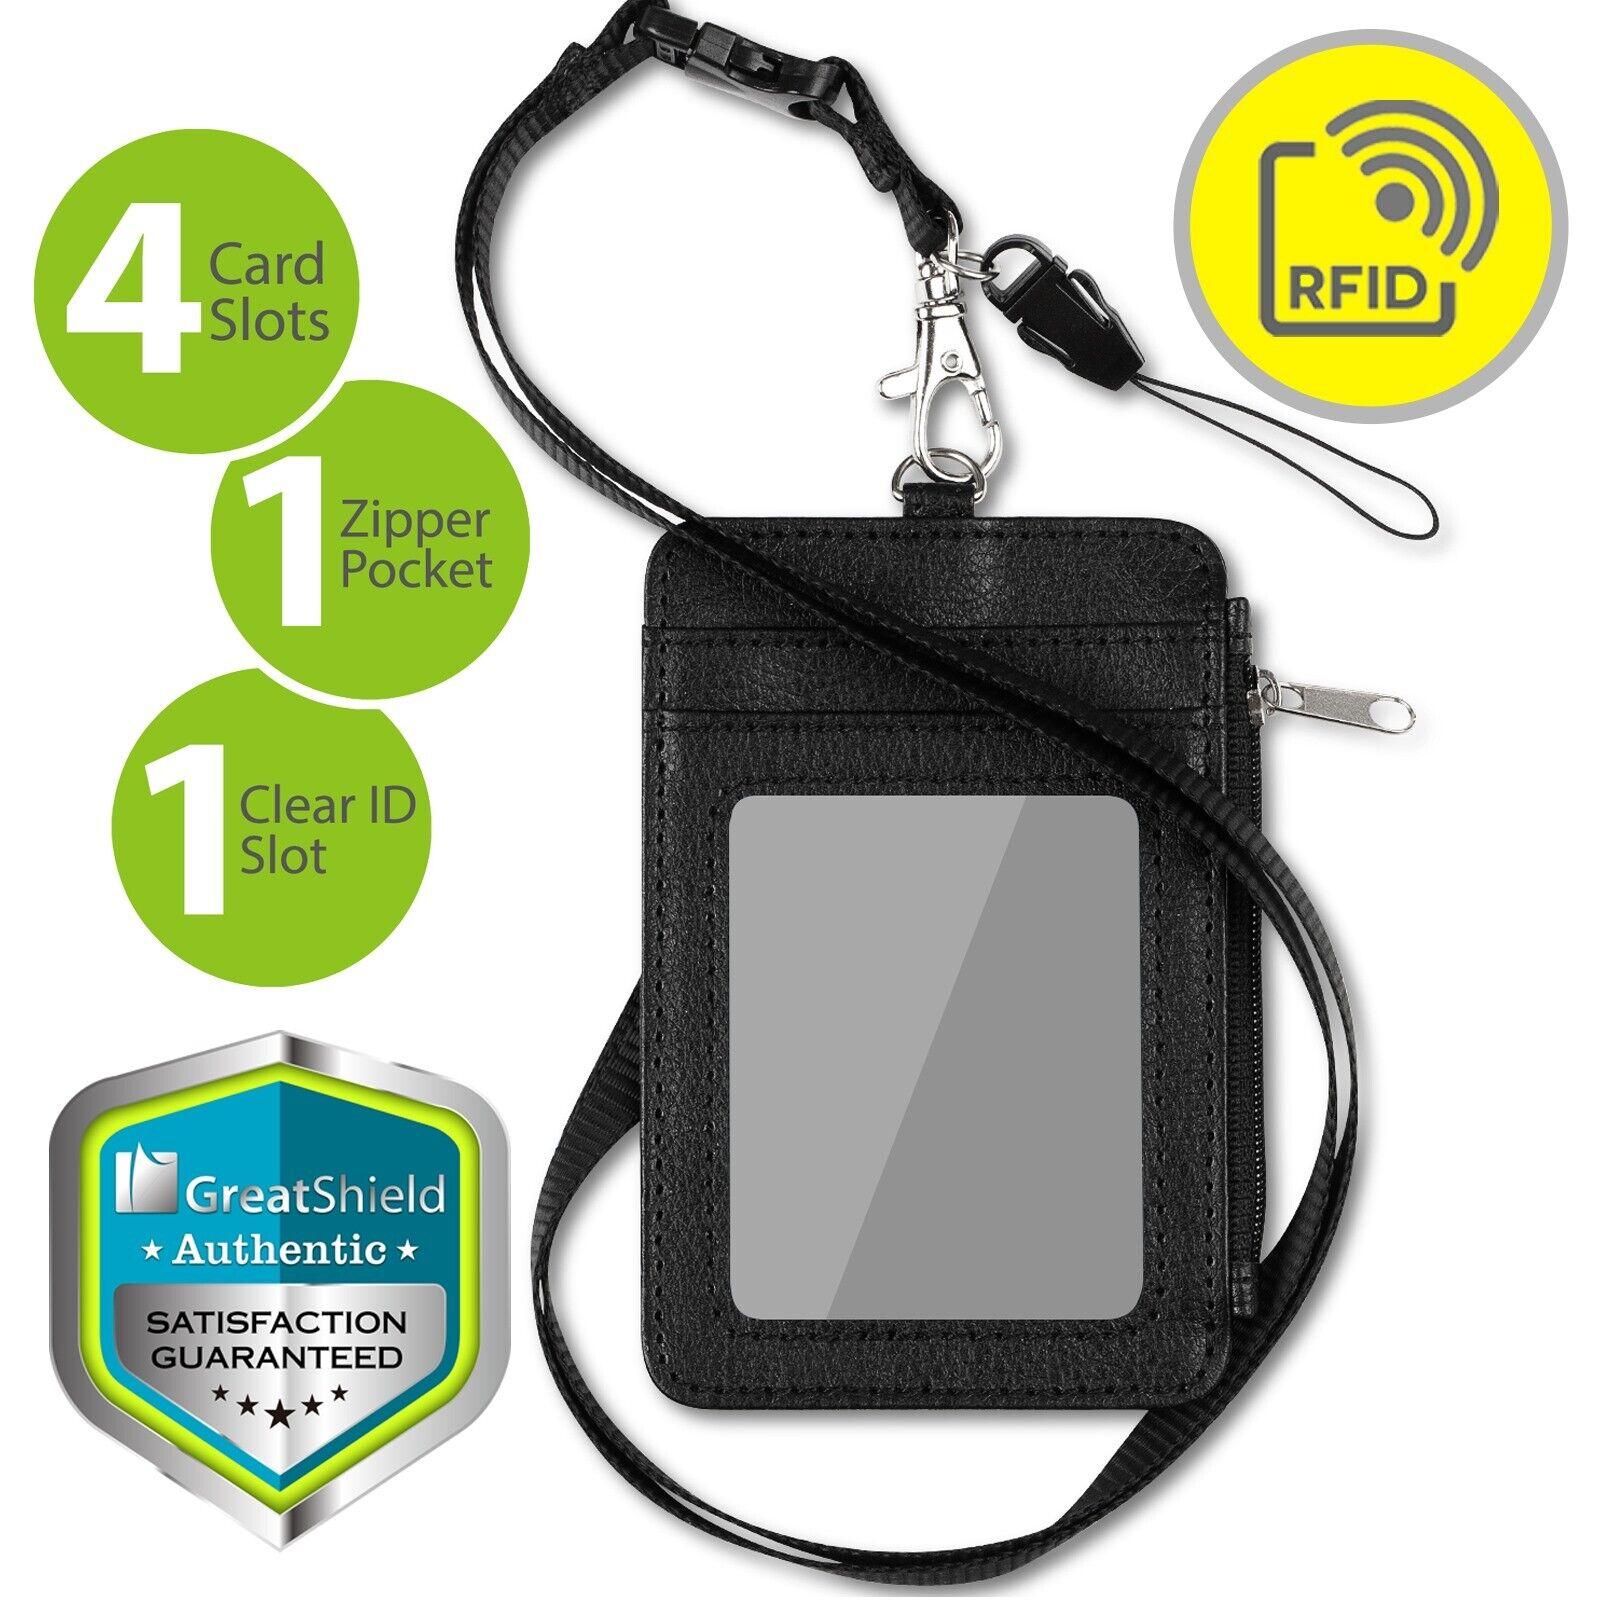 GreatShield RFID Blocking Leather 9 Slot Passport Card